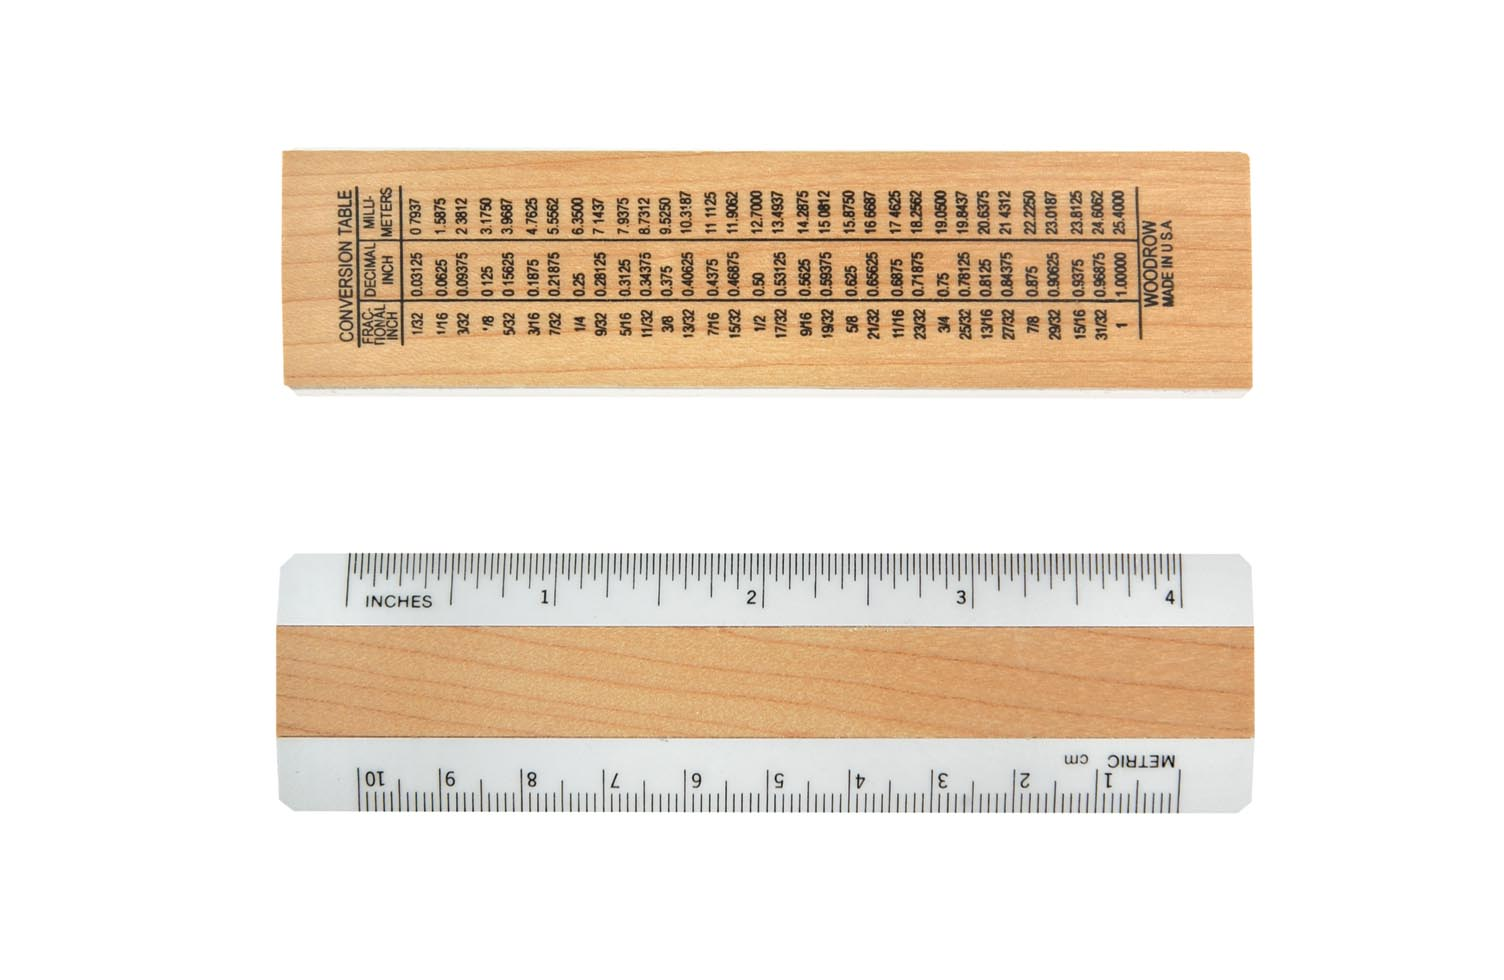 43a metric ruler